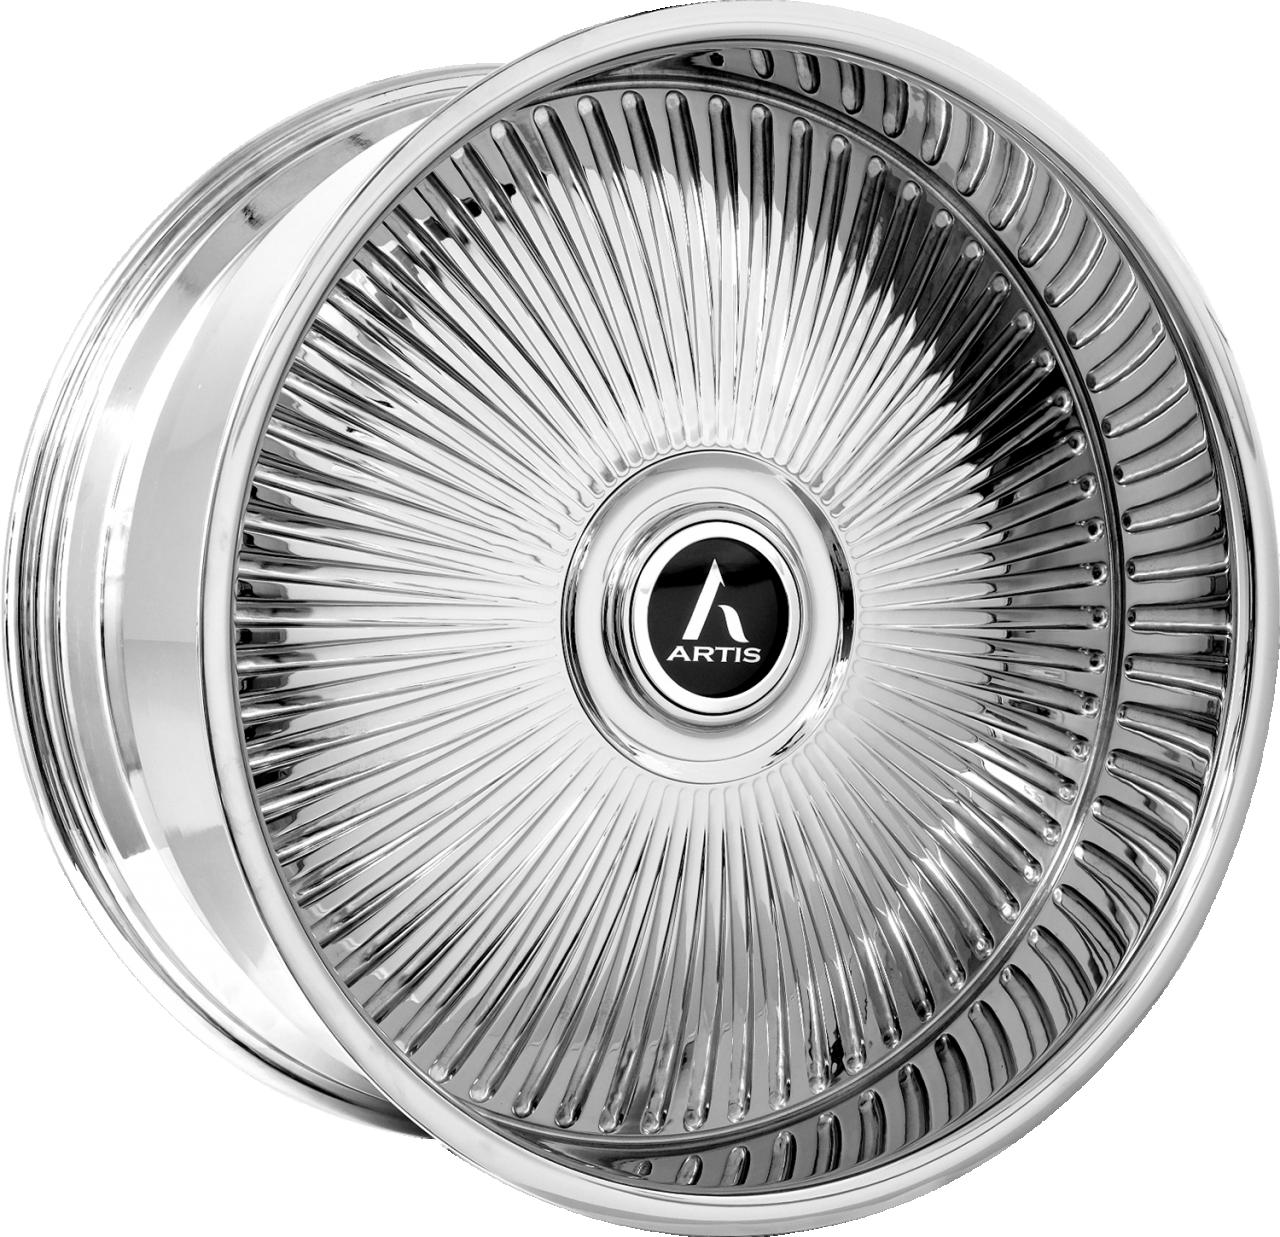 Artis Forged Reno-M wheel with Chrome finish